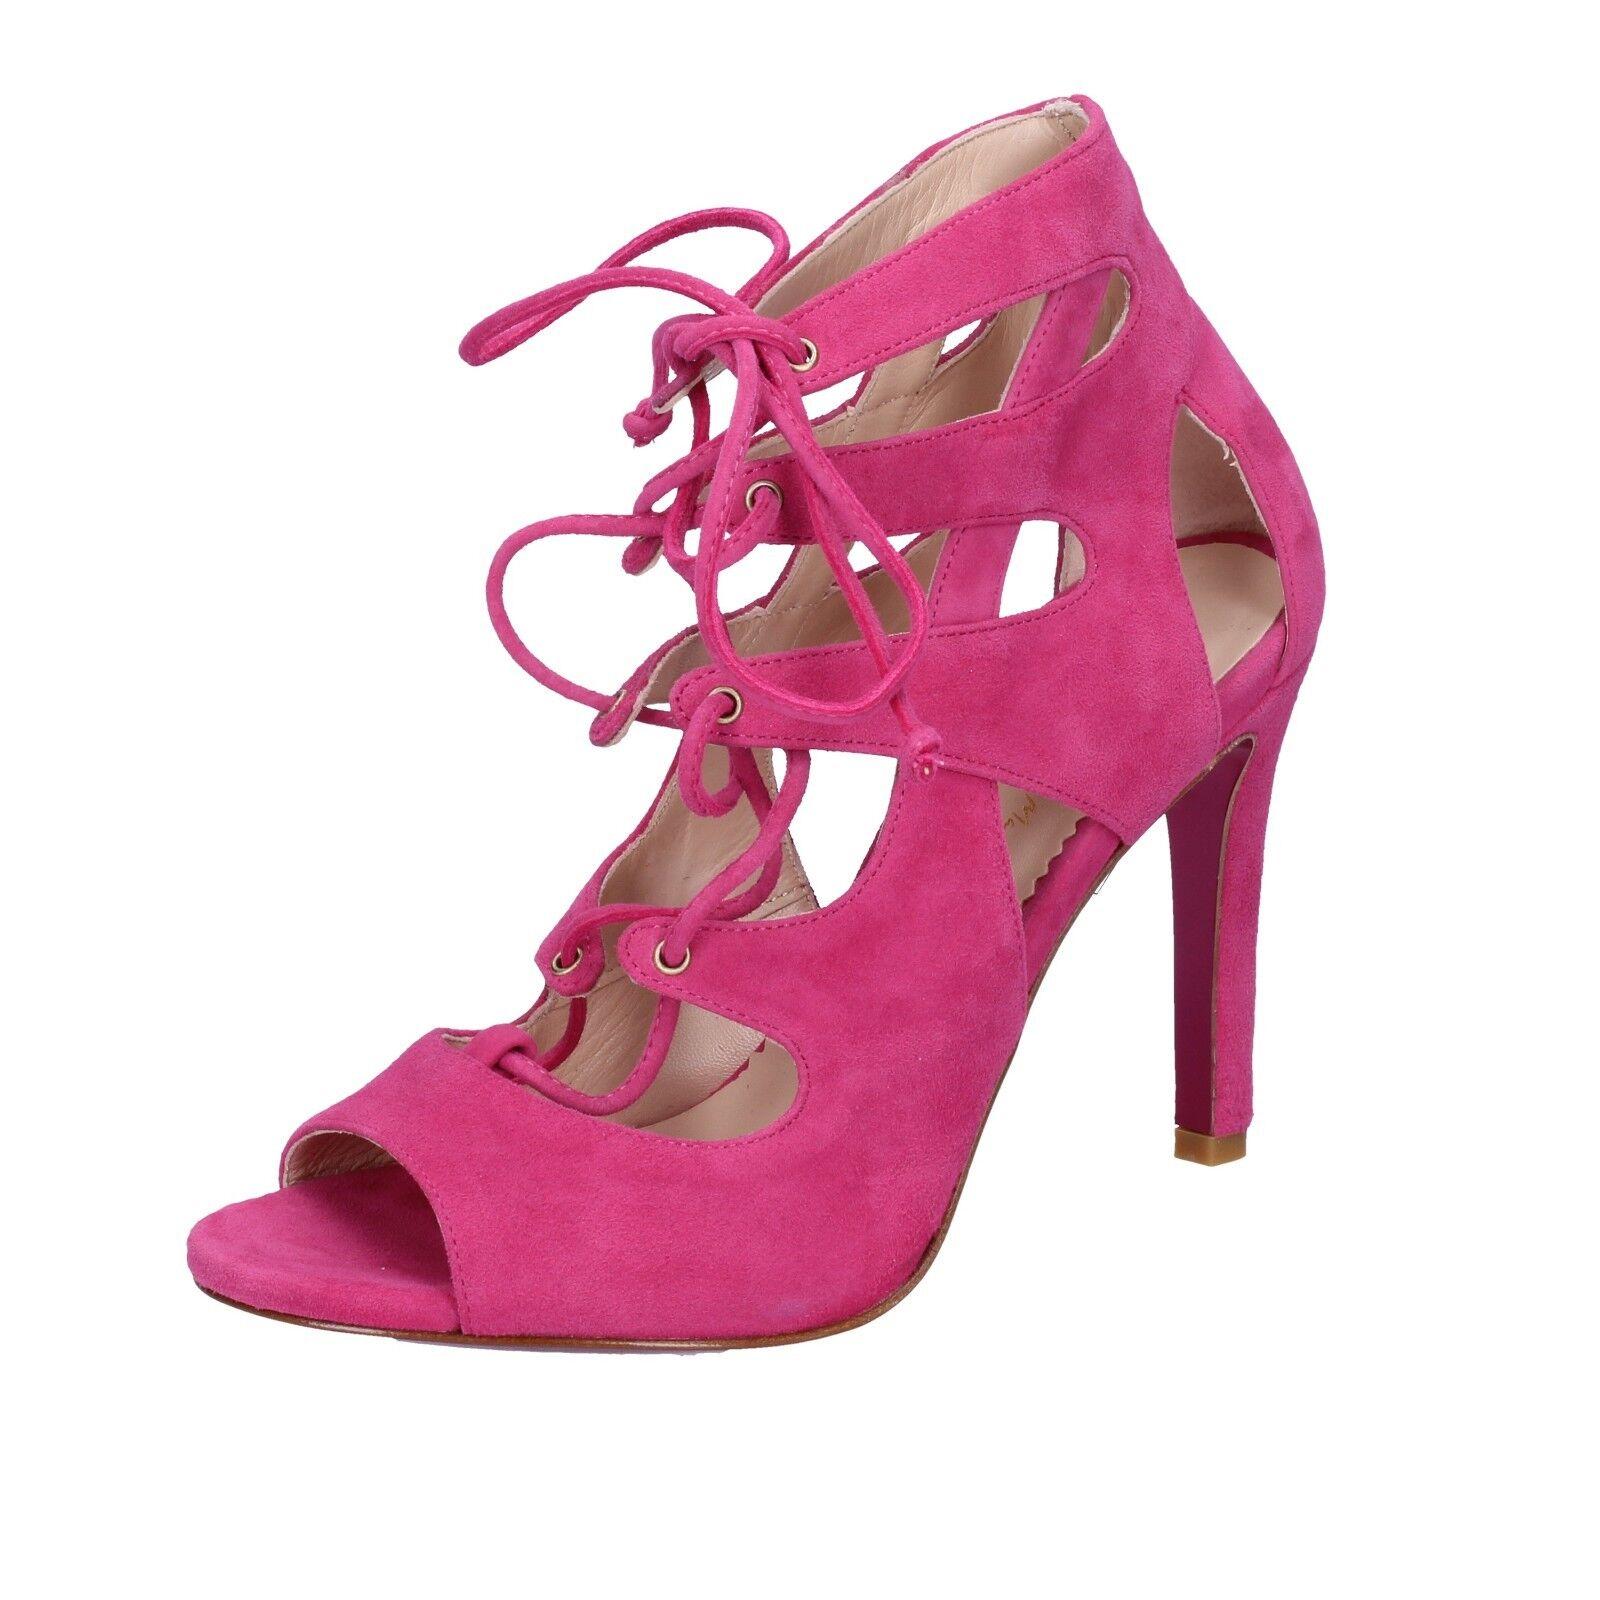 Chaussures Pointure Georgia May Jagger MINELLI 7 (UE 40) Sandales Fucsia Daim BT589-40